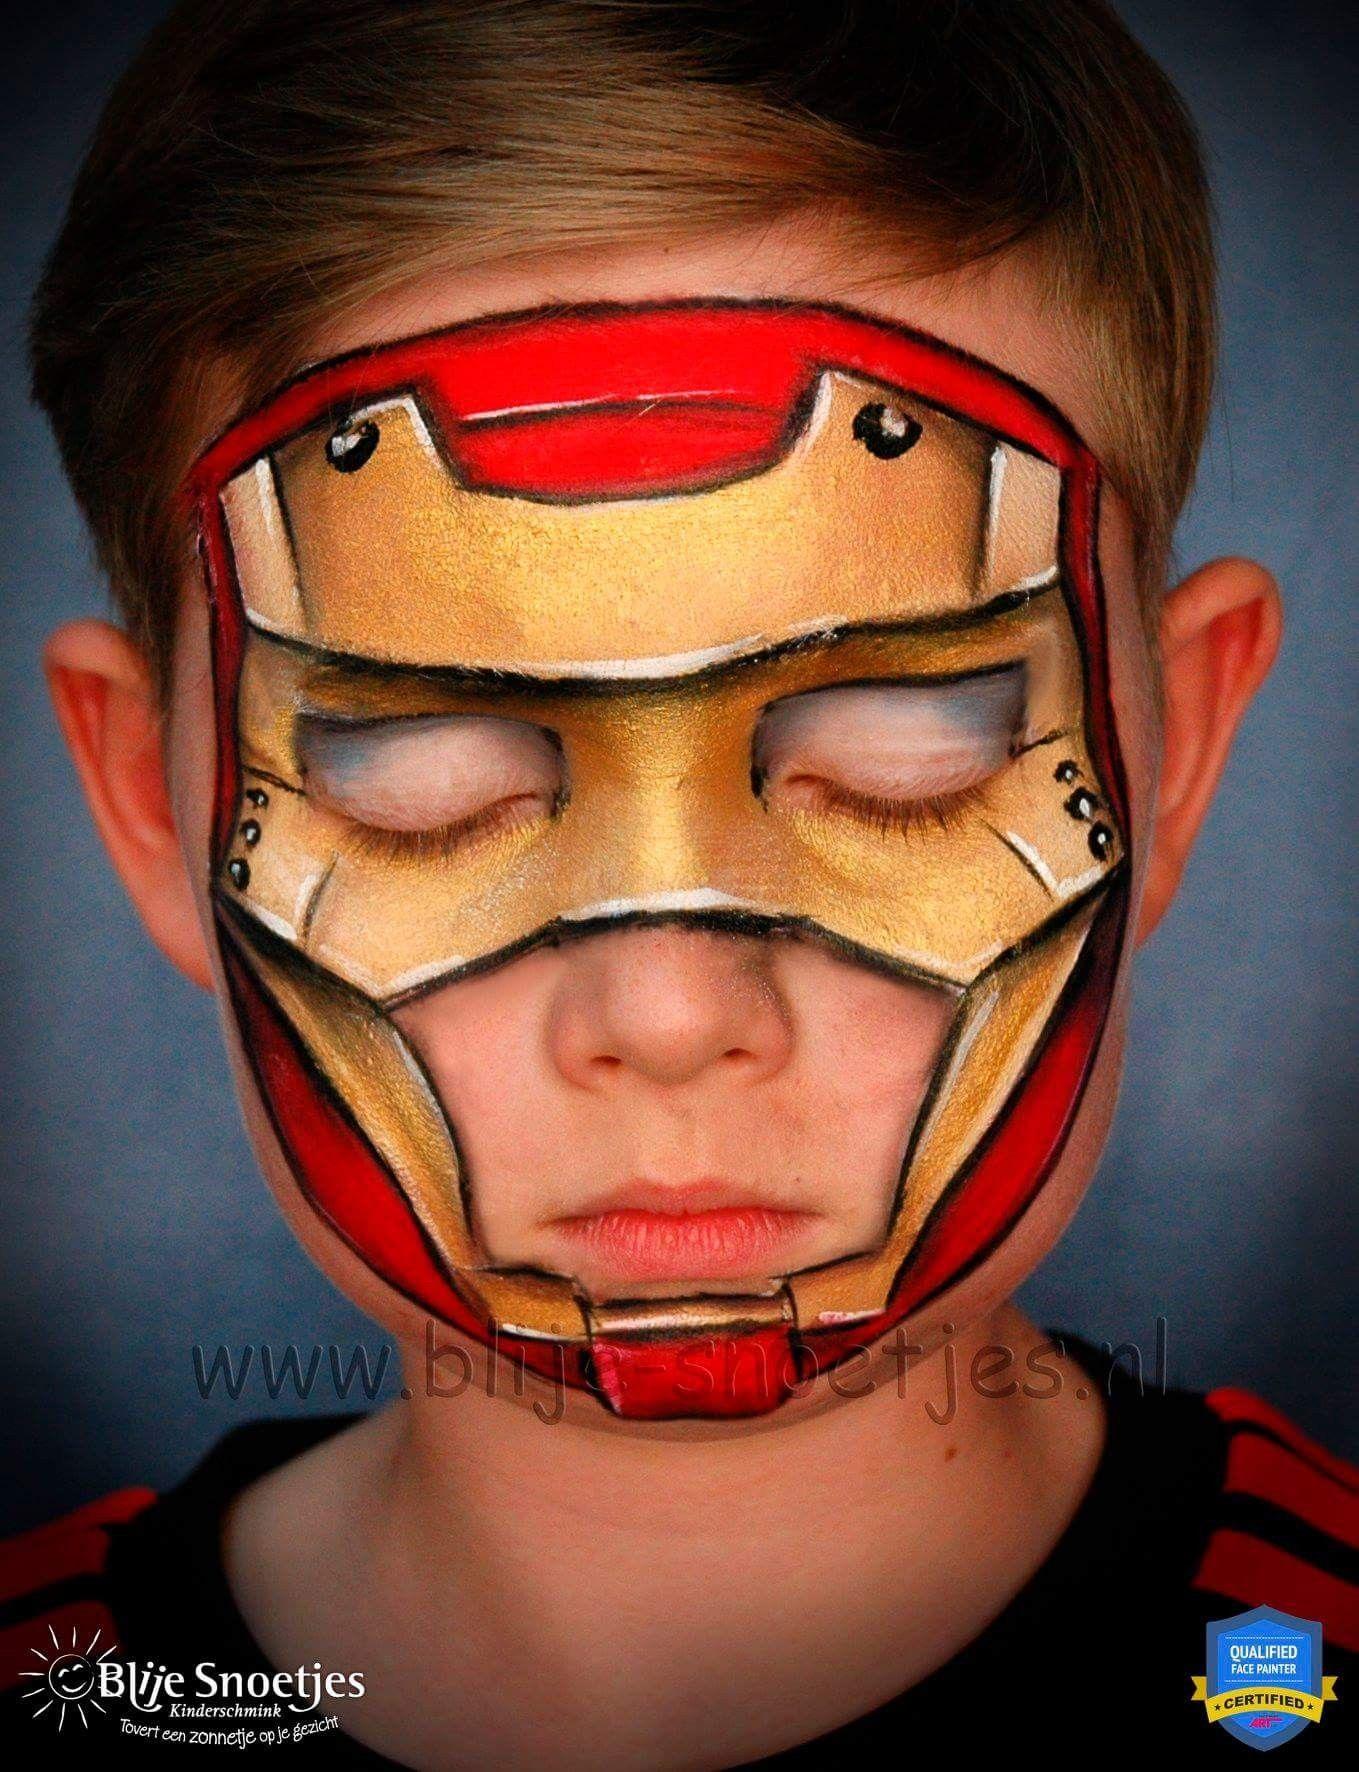 Disfraz Iron Maquillaje De Superheroes Maquillaje De Fantasia Infantil Disenos De Pintura De La Cara